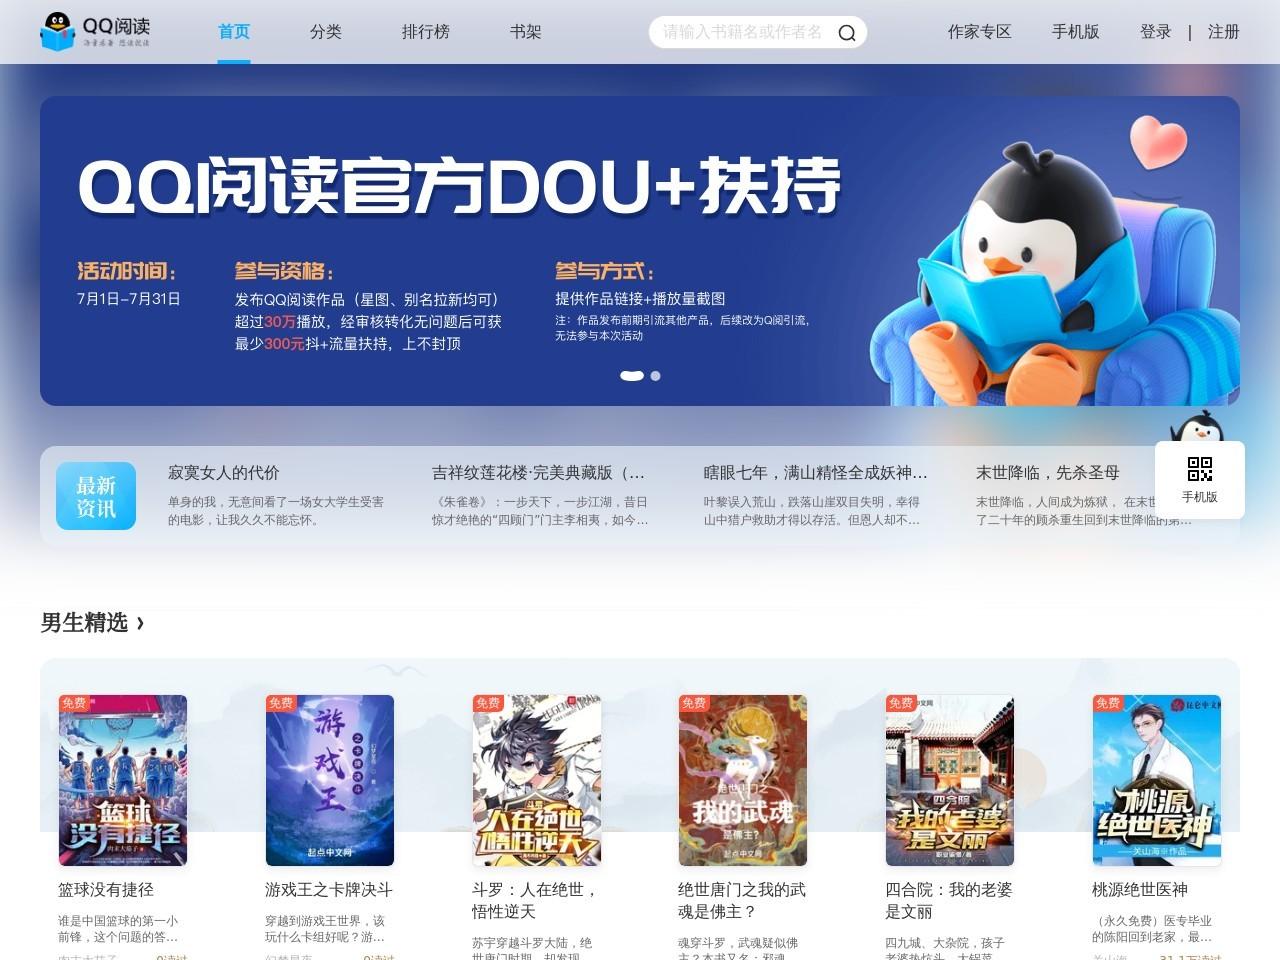 QQ阅读 - 腾讯文学 - 文字之美,感动心灵